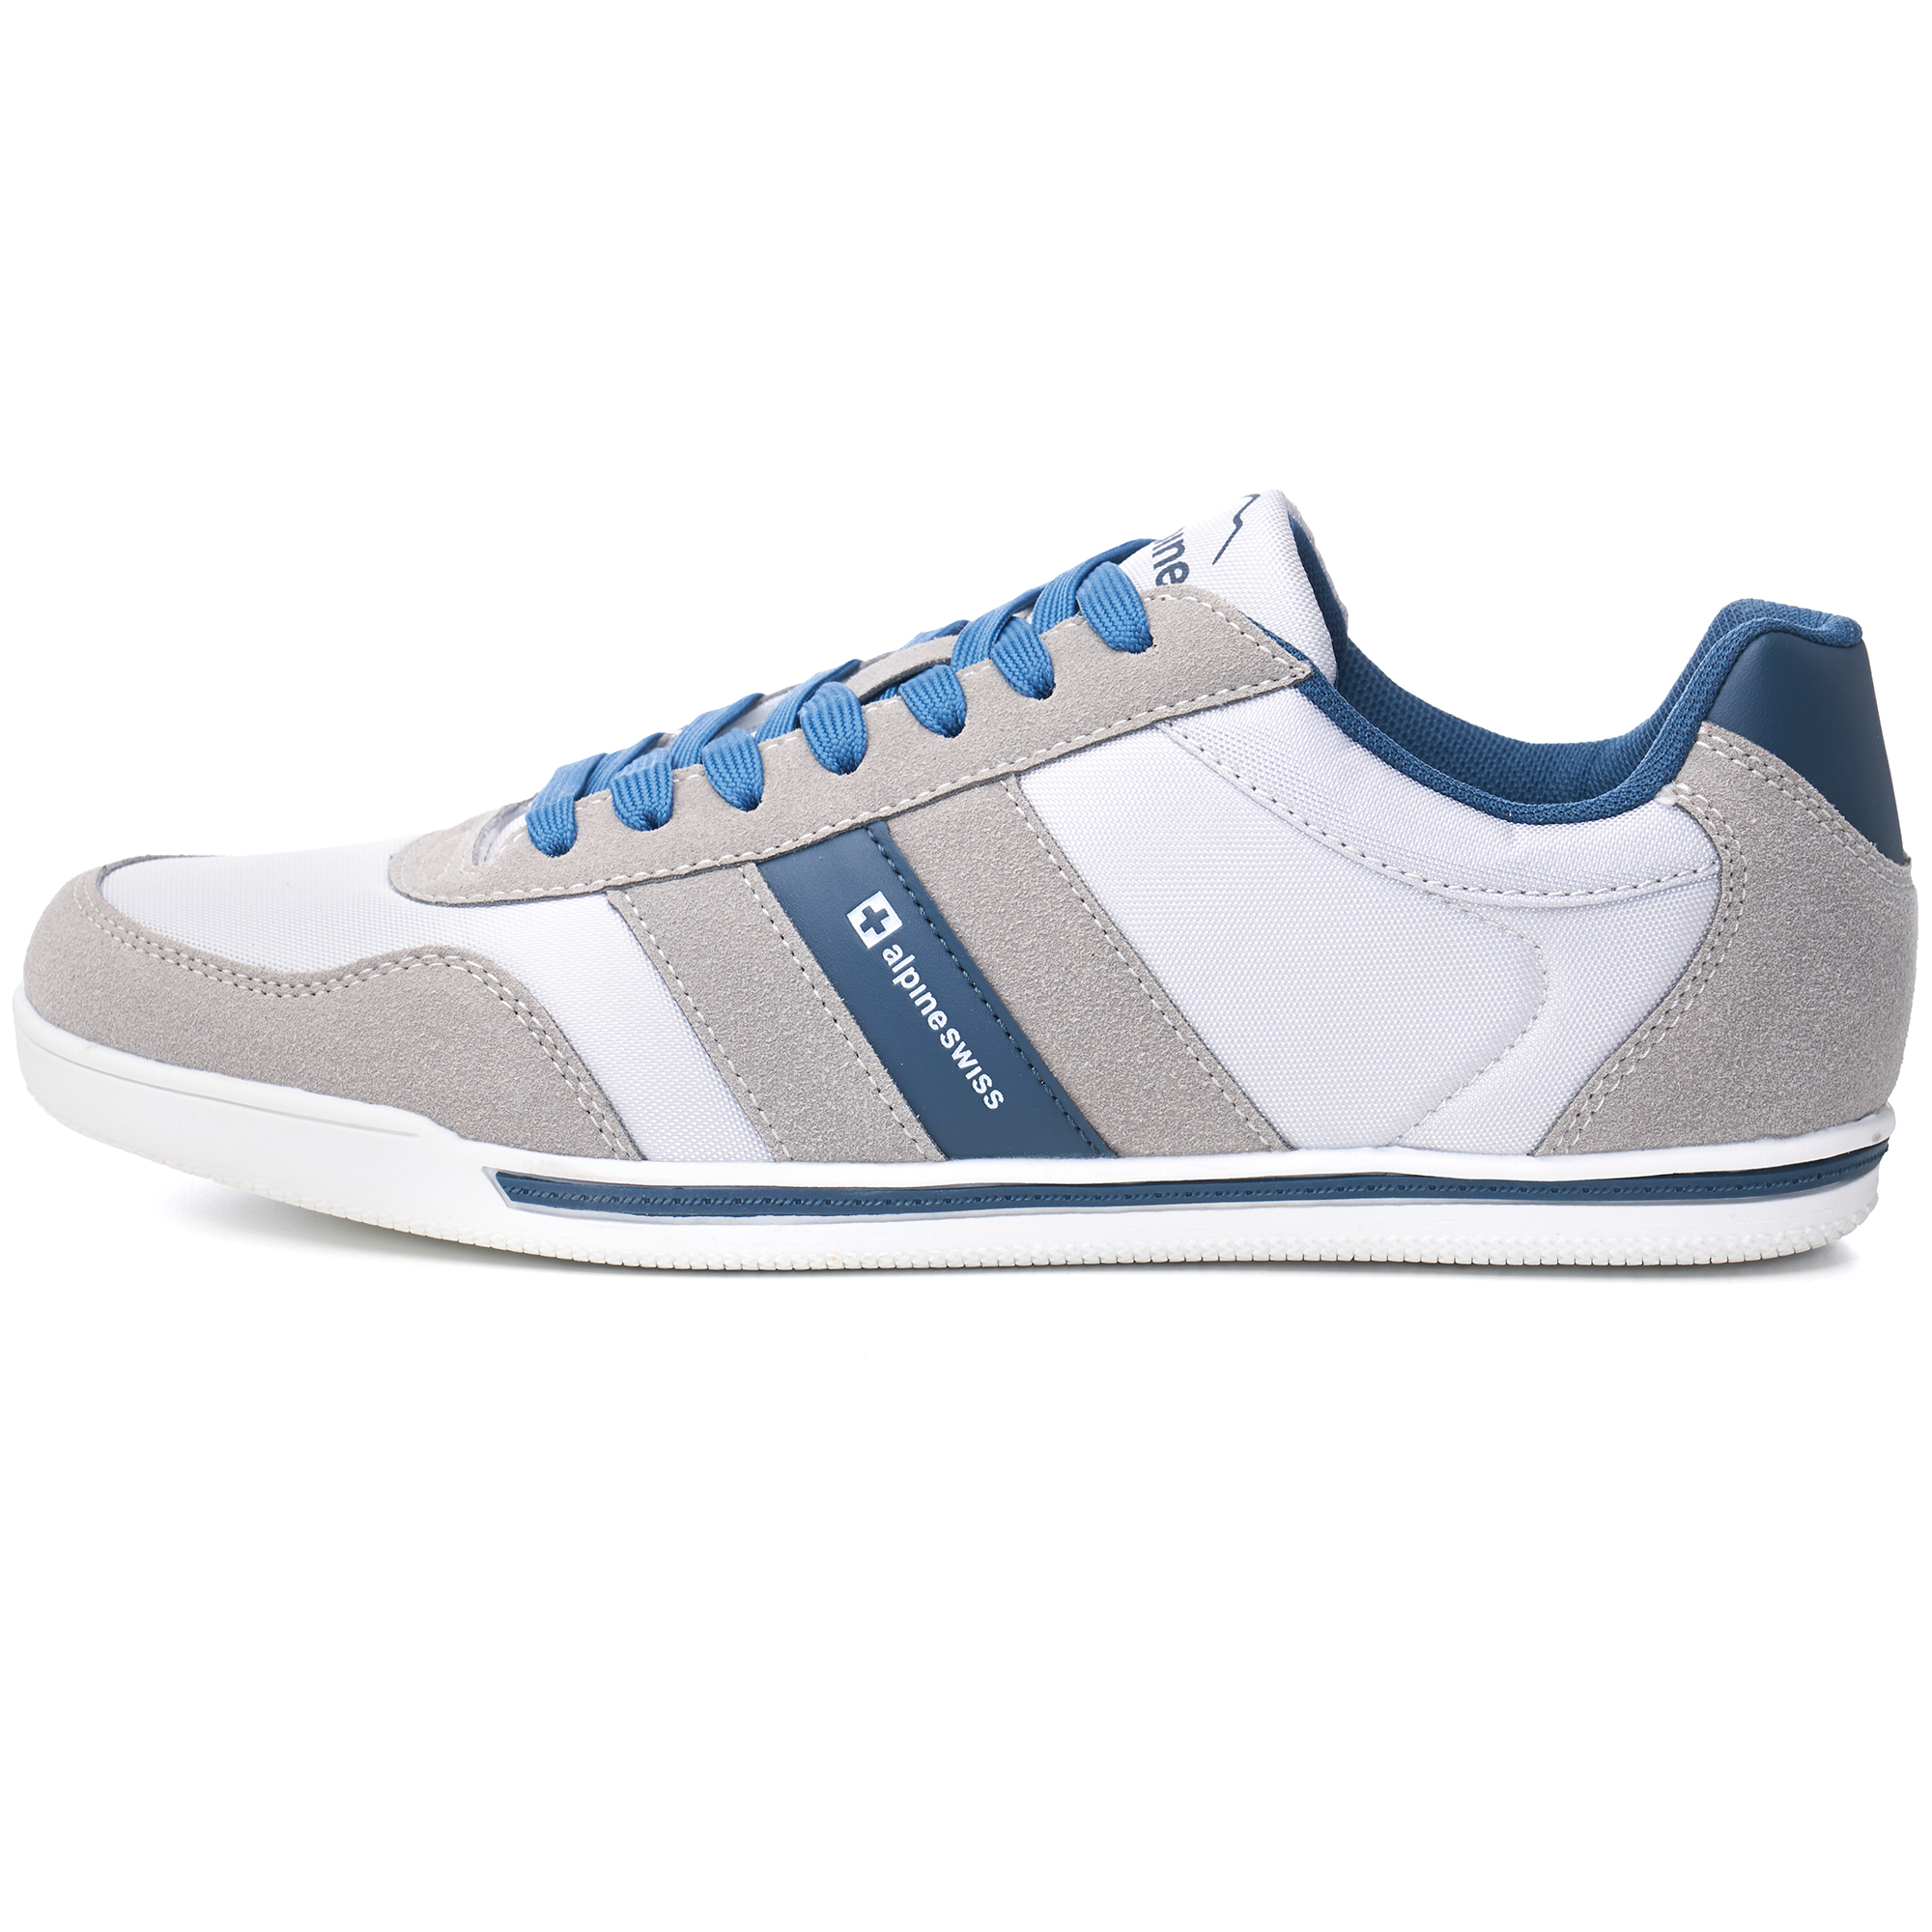 Alpine-Swiss-Haris-Mens-Retro-Striped-Athletic-Shoes-Fashion-Sneaker-Tennis-Shoe thumbnail 10